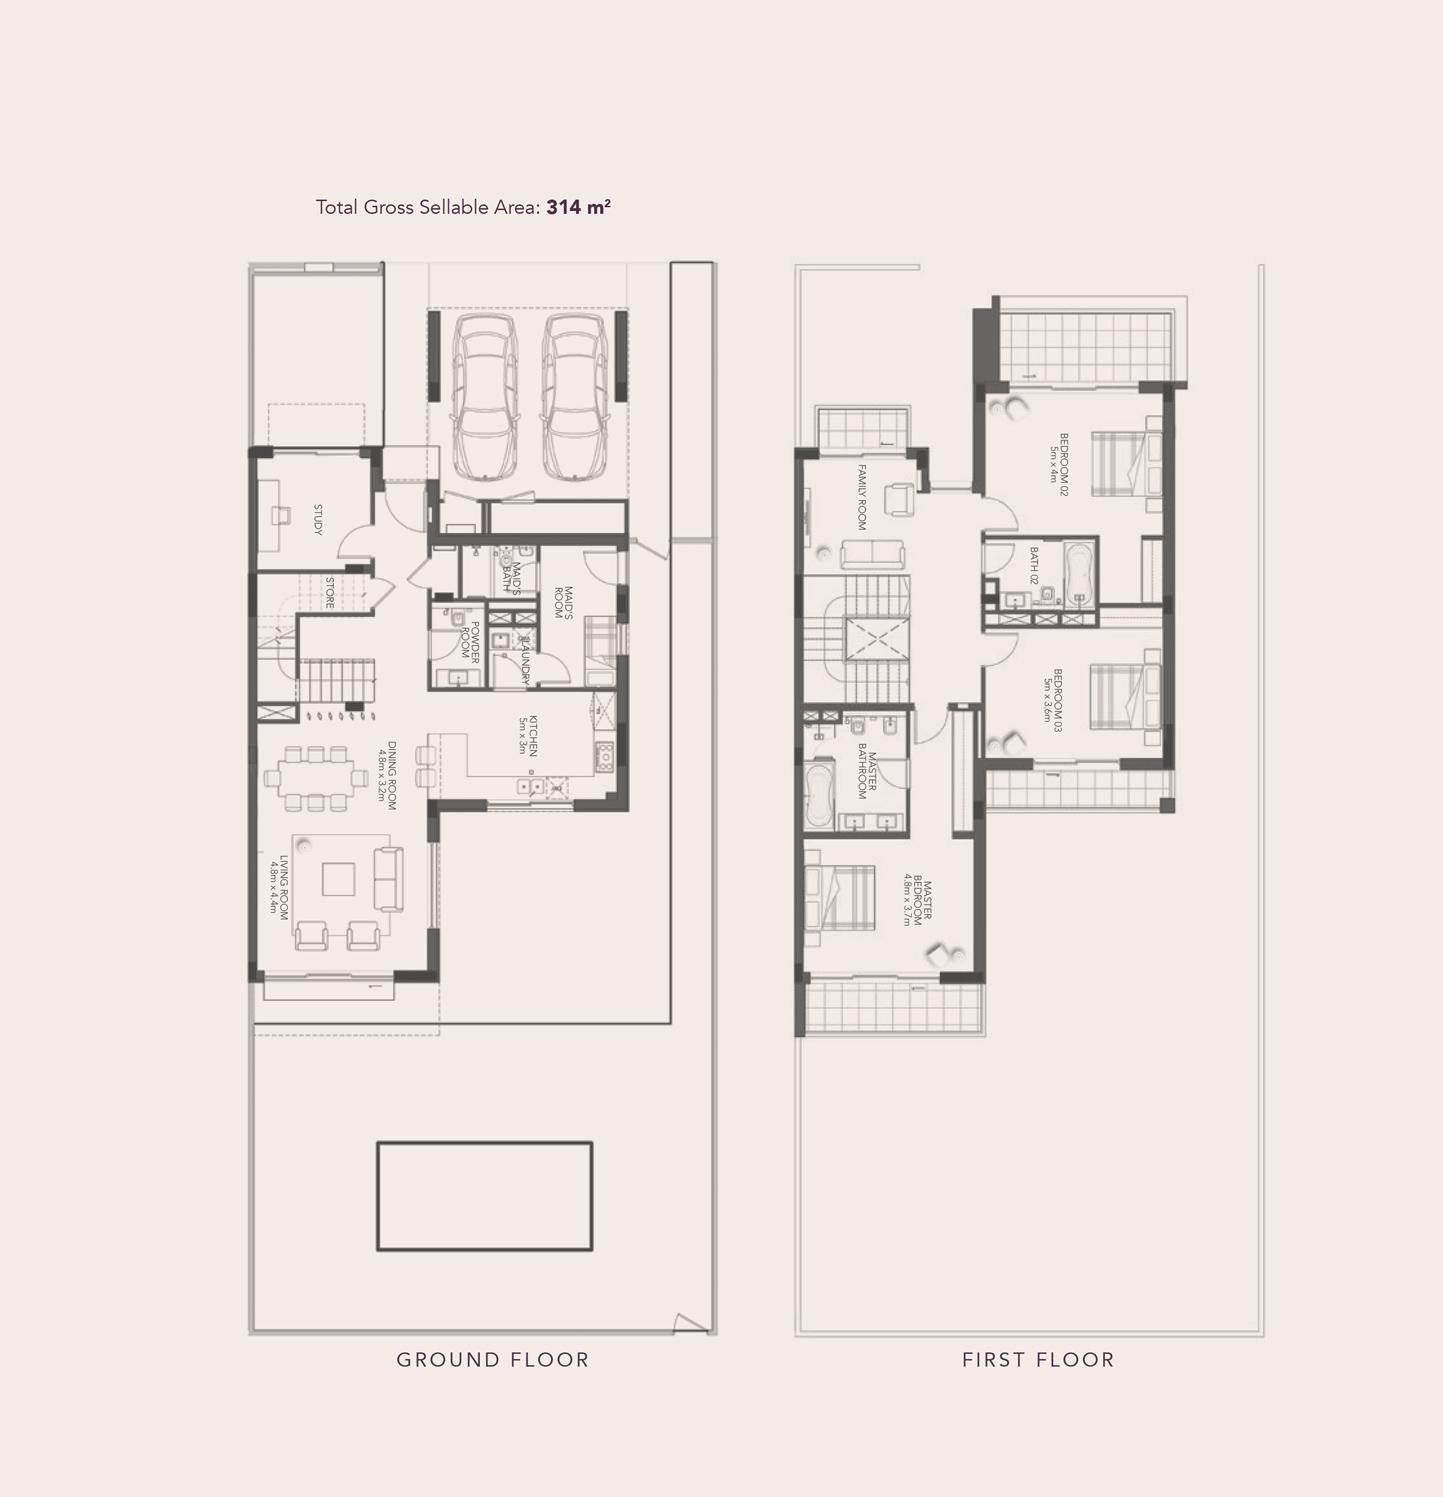 3 غرف نوم – فيلا شبه منفصلة - نوع -B-3Y